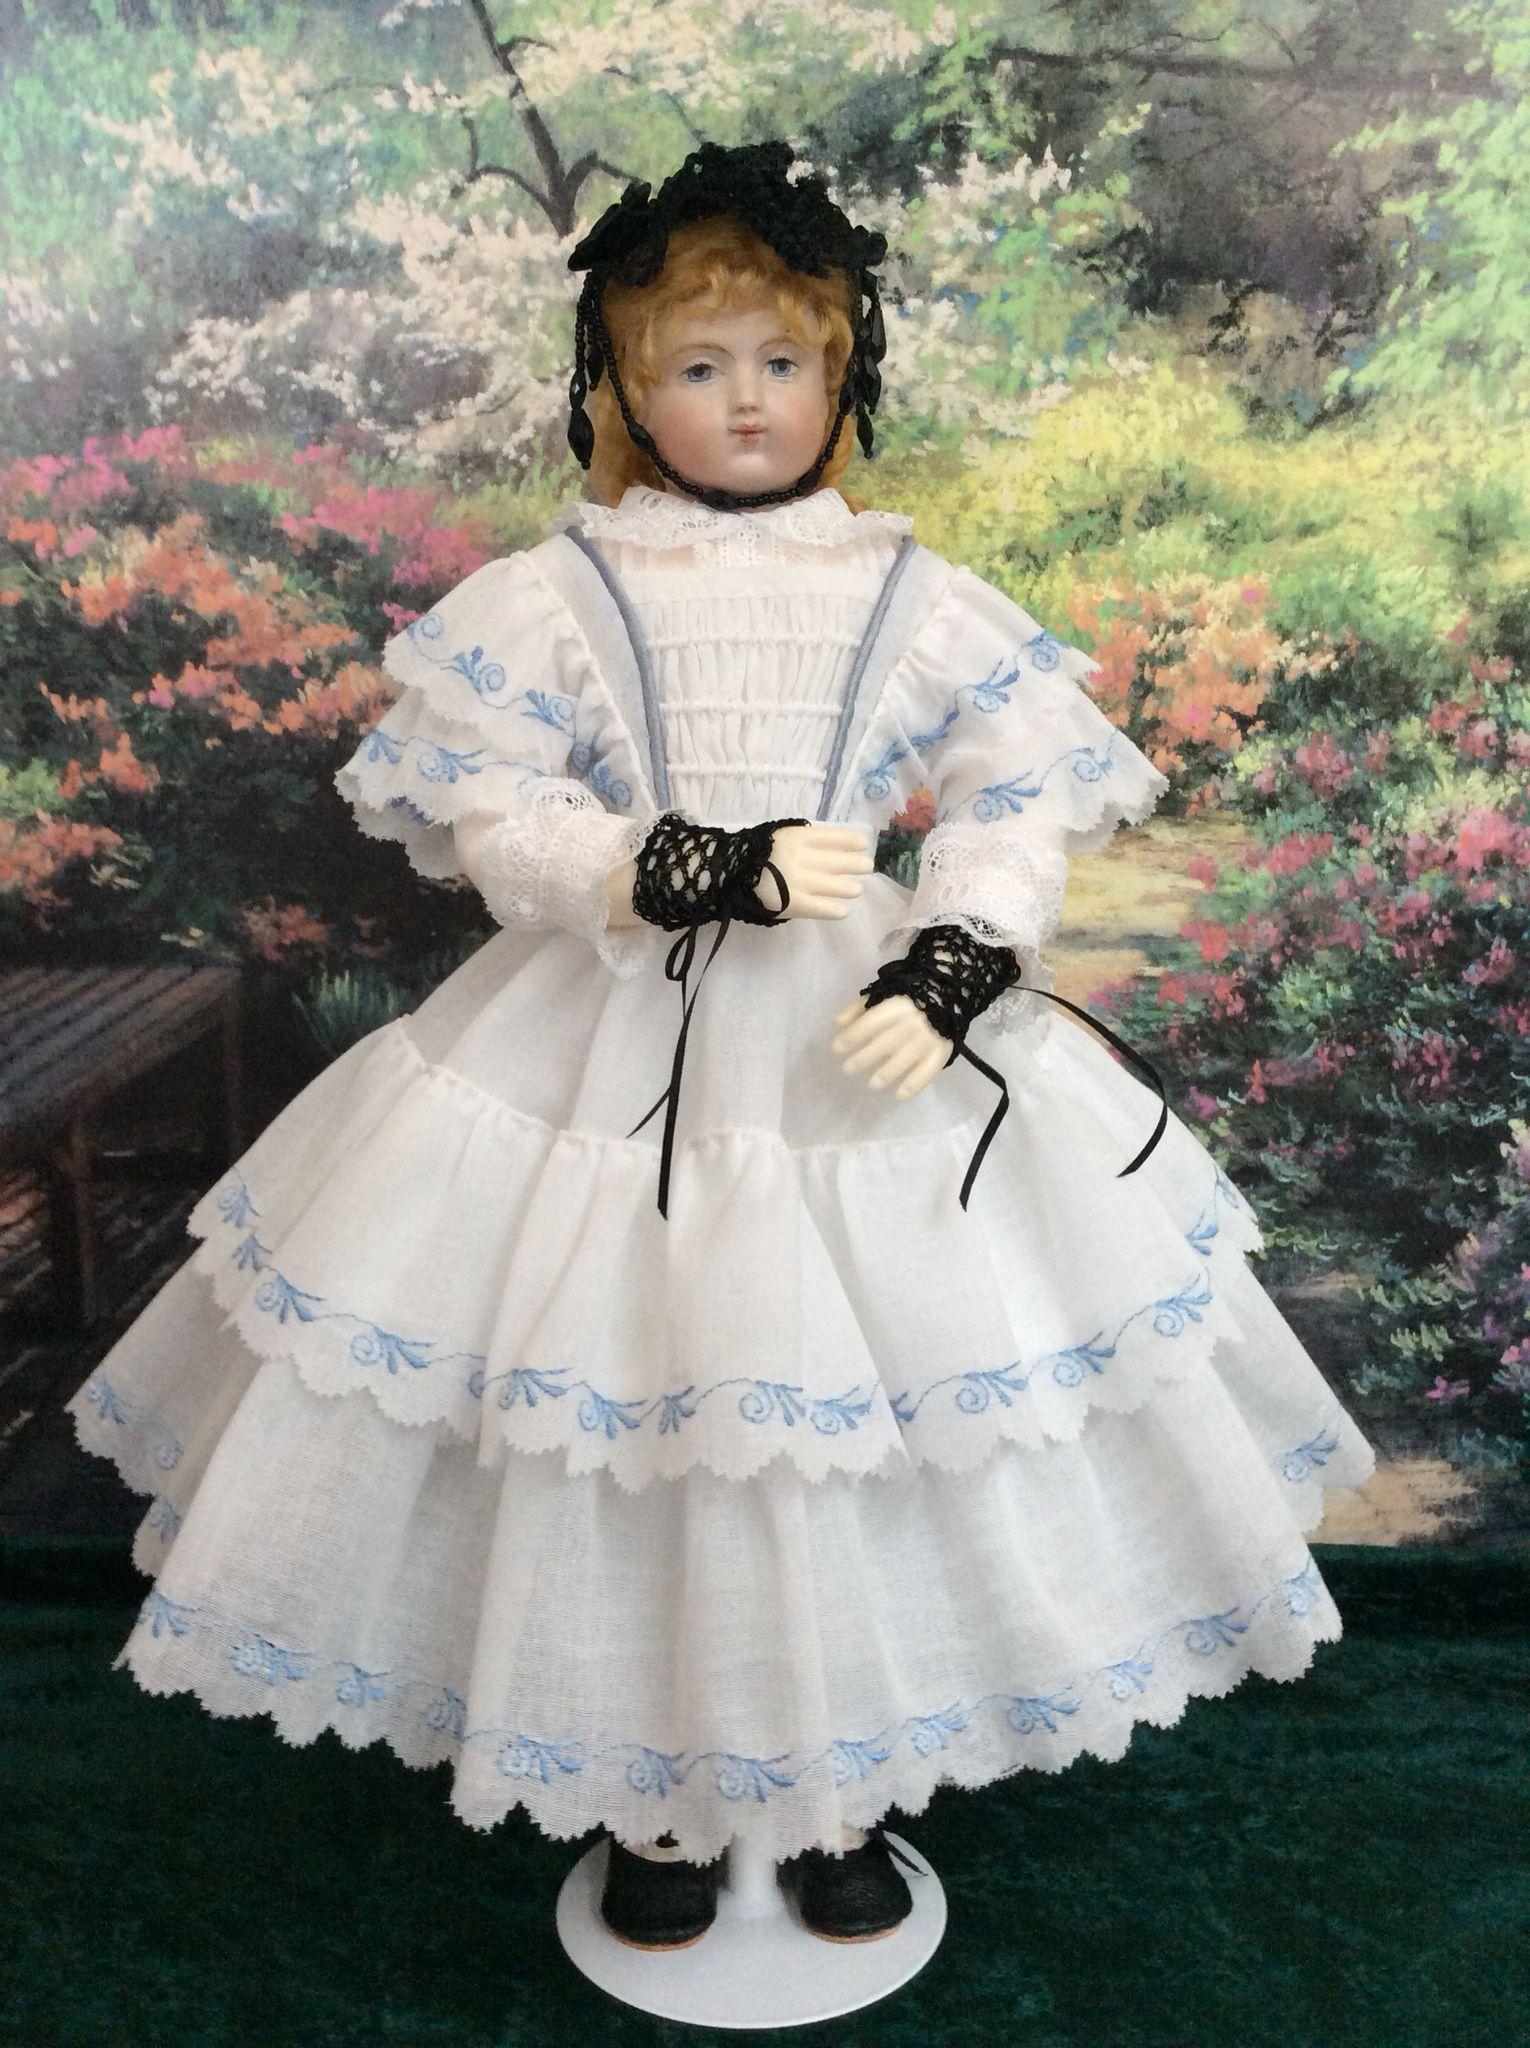 Pin by Mary Ann Shandor on HURET & ROHMER DOLLS Doll